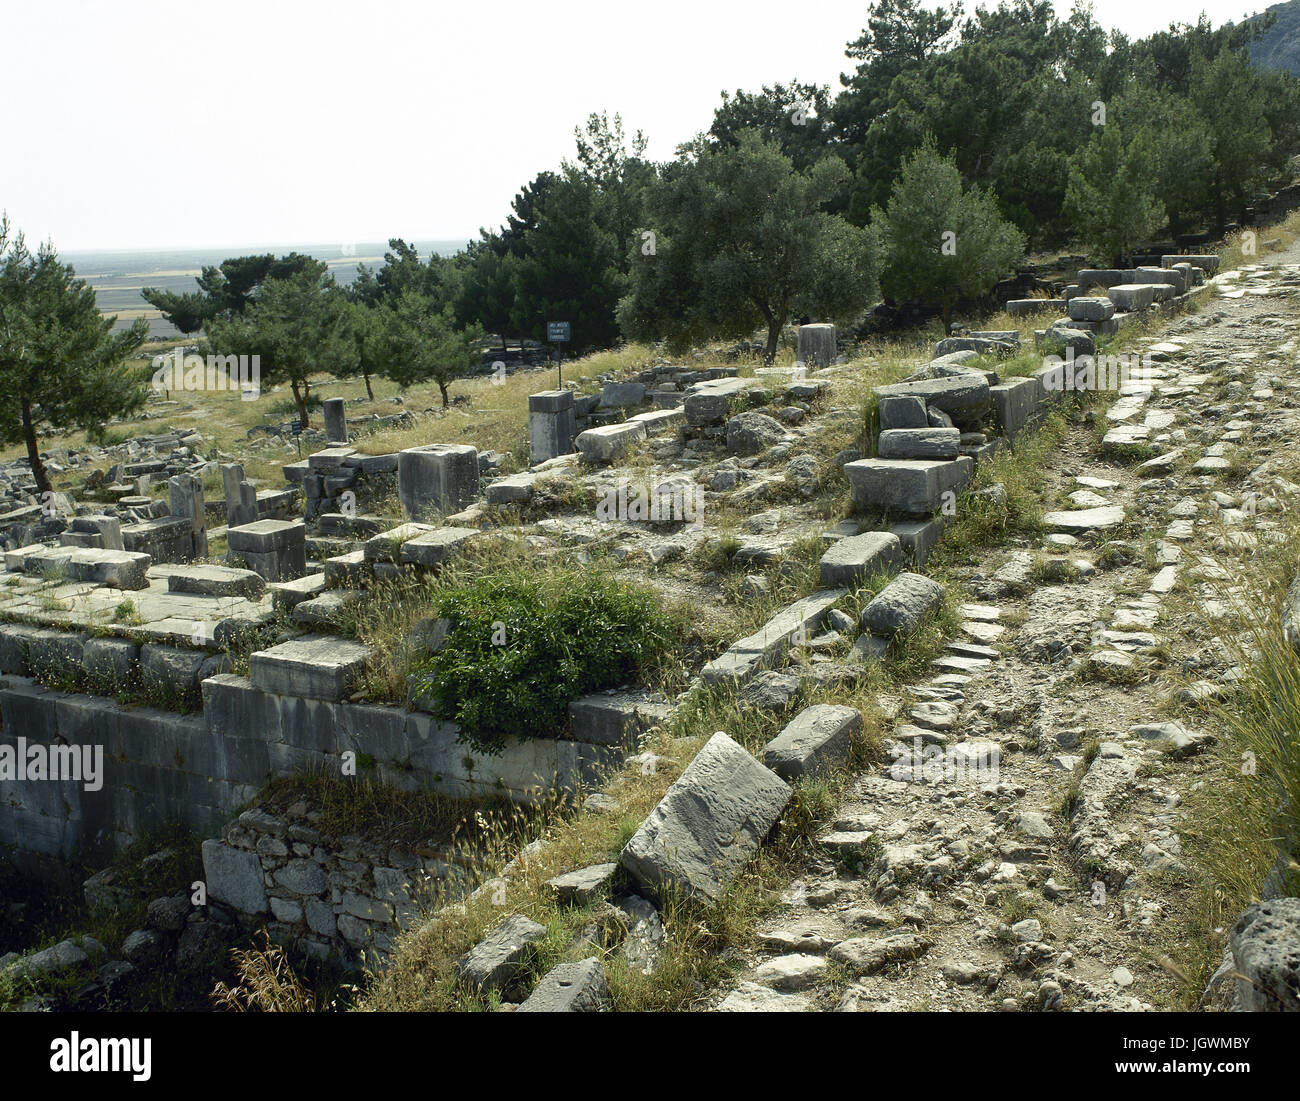 Turkey. Priene. Ancient Greek city of Ionia. Hellenistic style. Ruins. Anatolia. - Stock Image